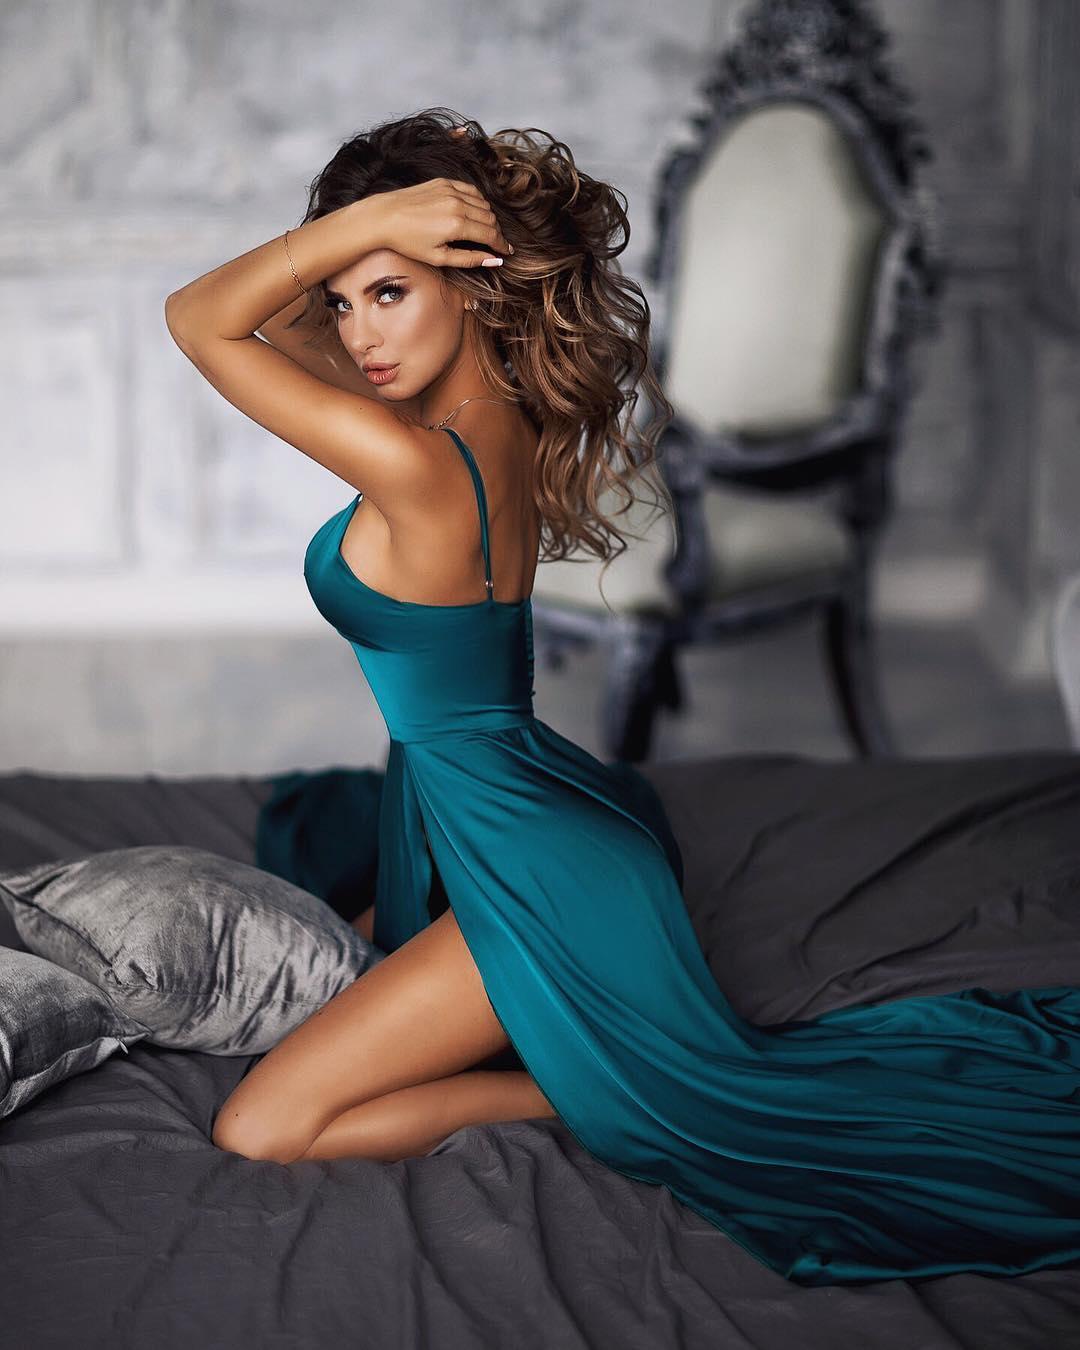 Hot Katerina Rubinovich nudes (54 photos), Topless, Cleavage, Selfie, cleavage 2015